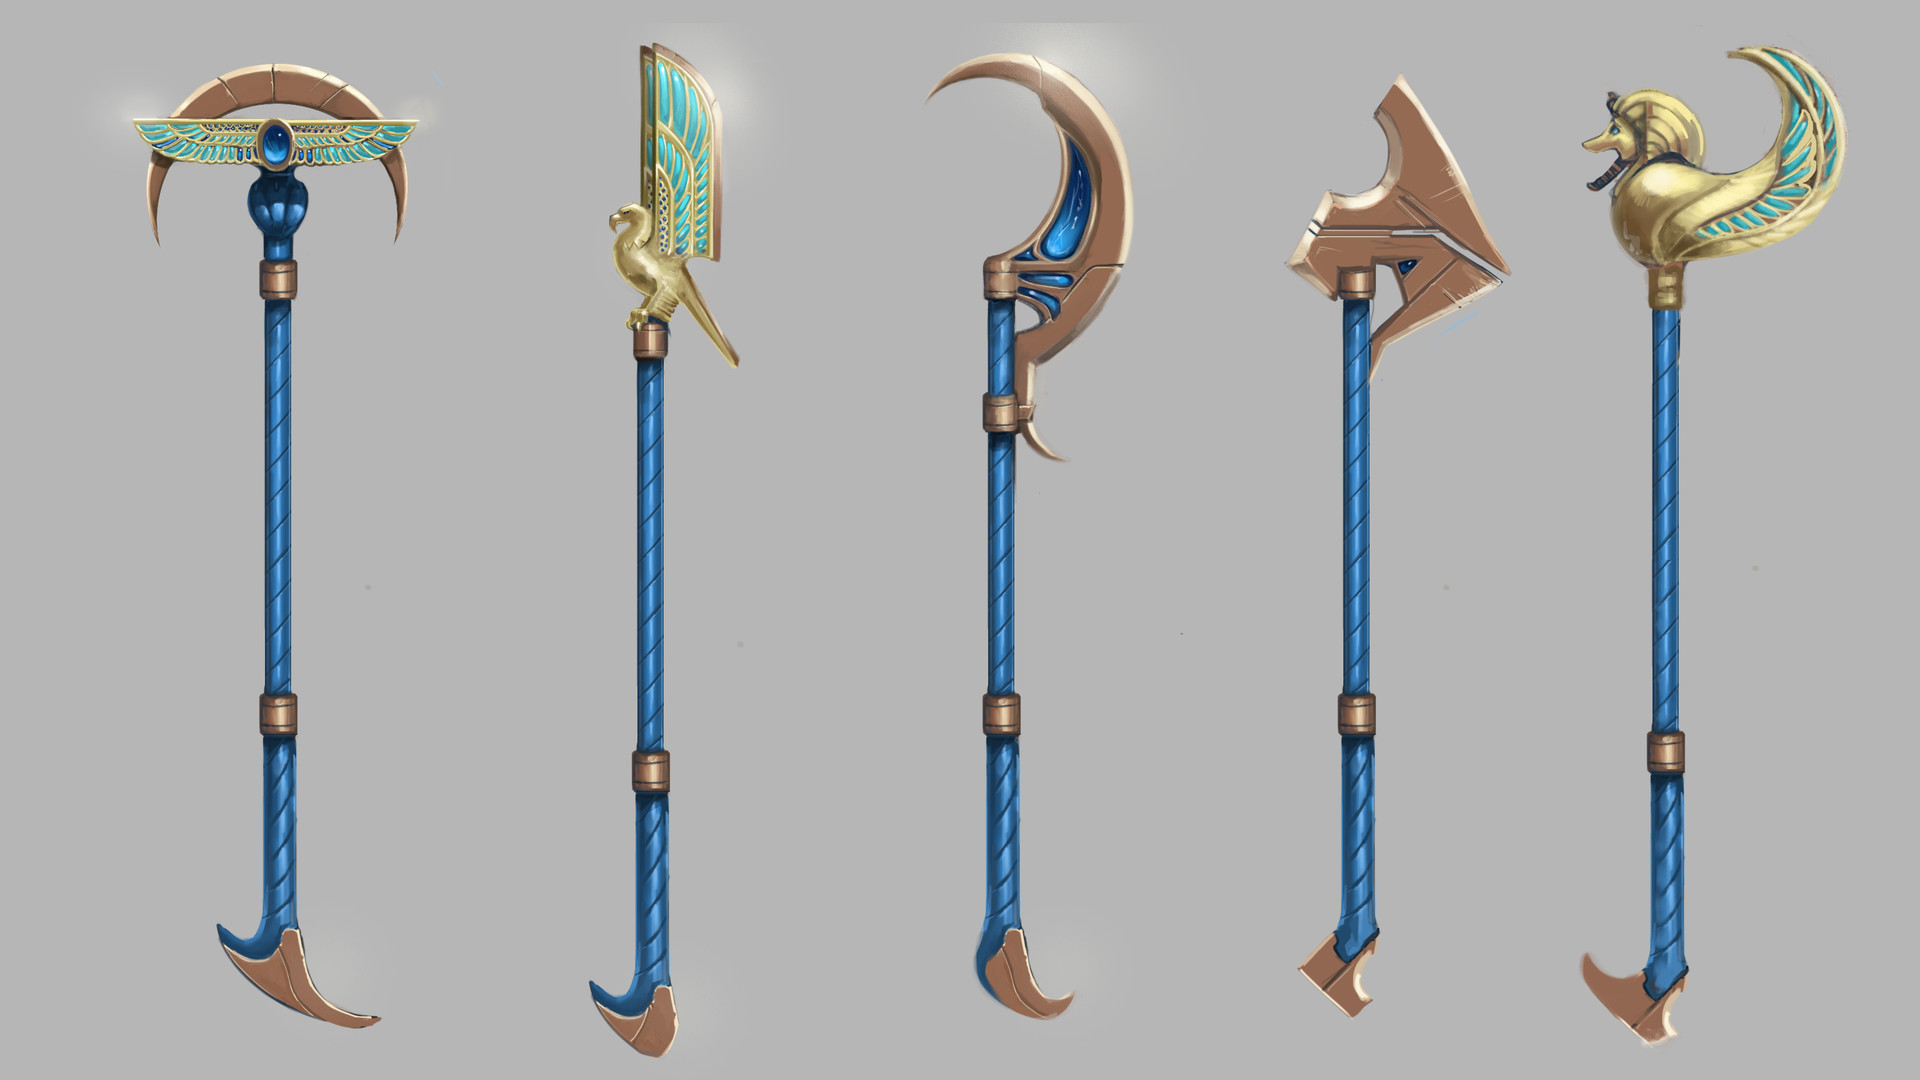 Carlo spagnola nasus pharoh weapons